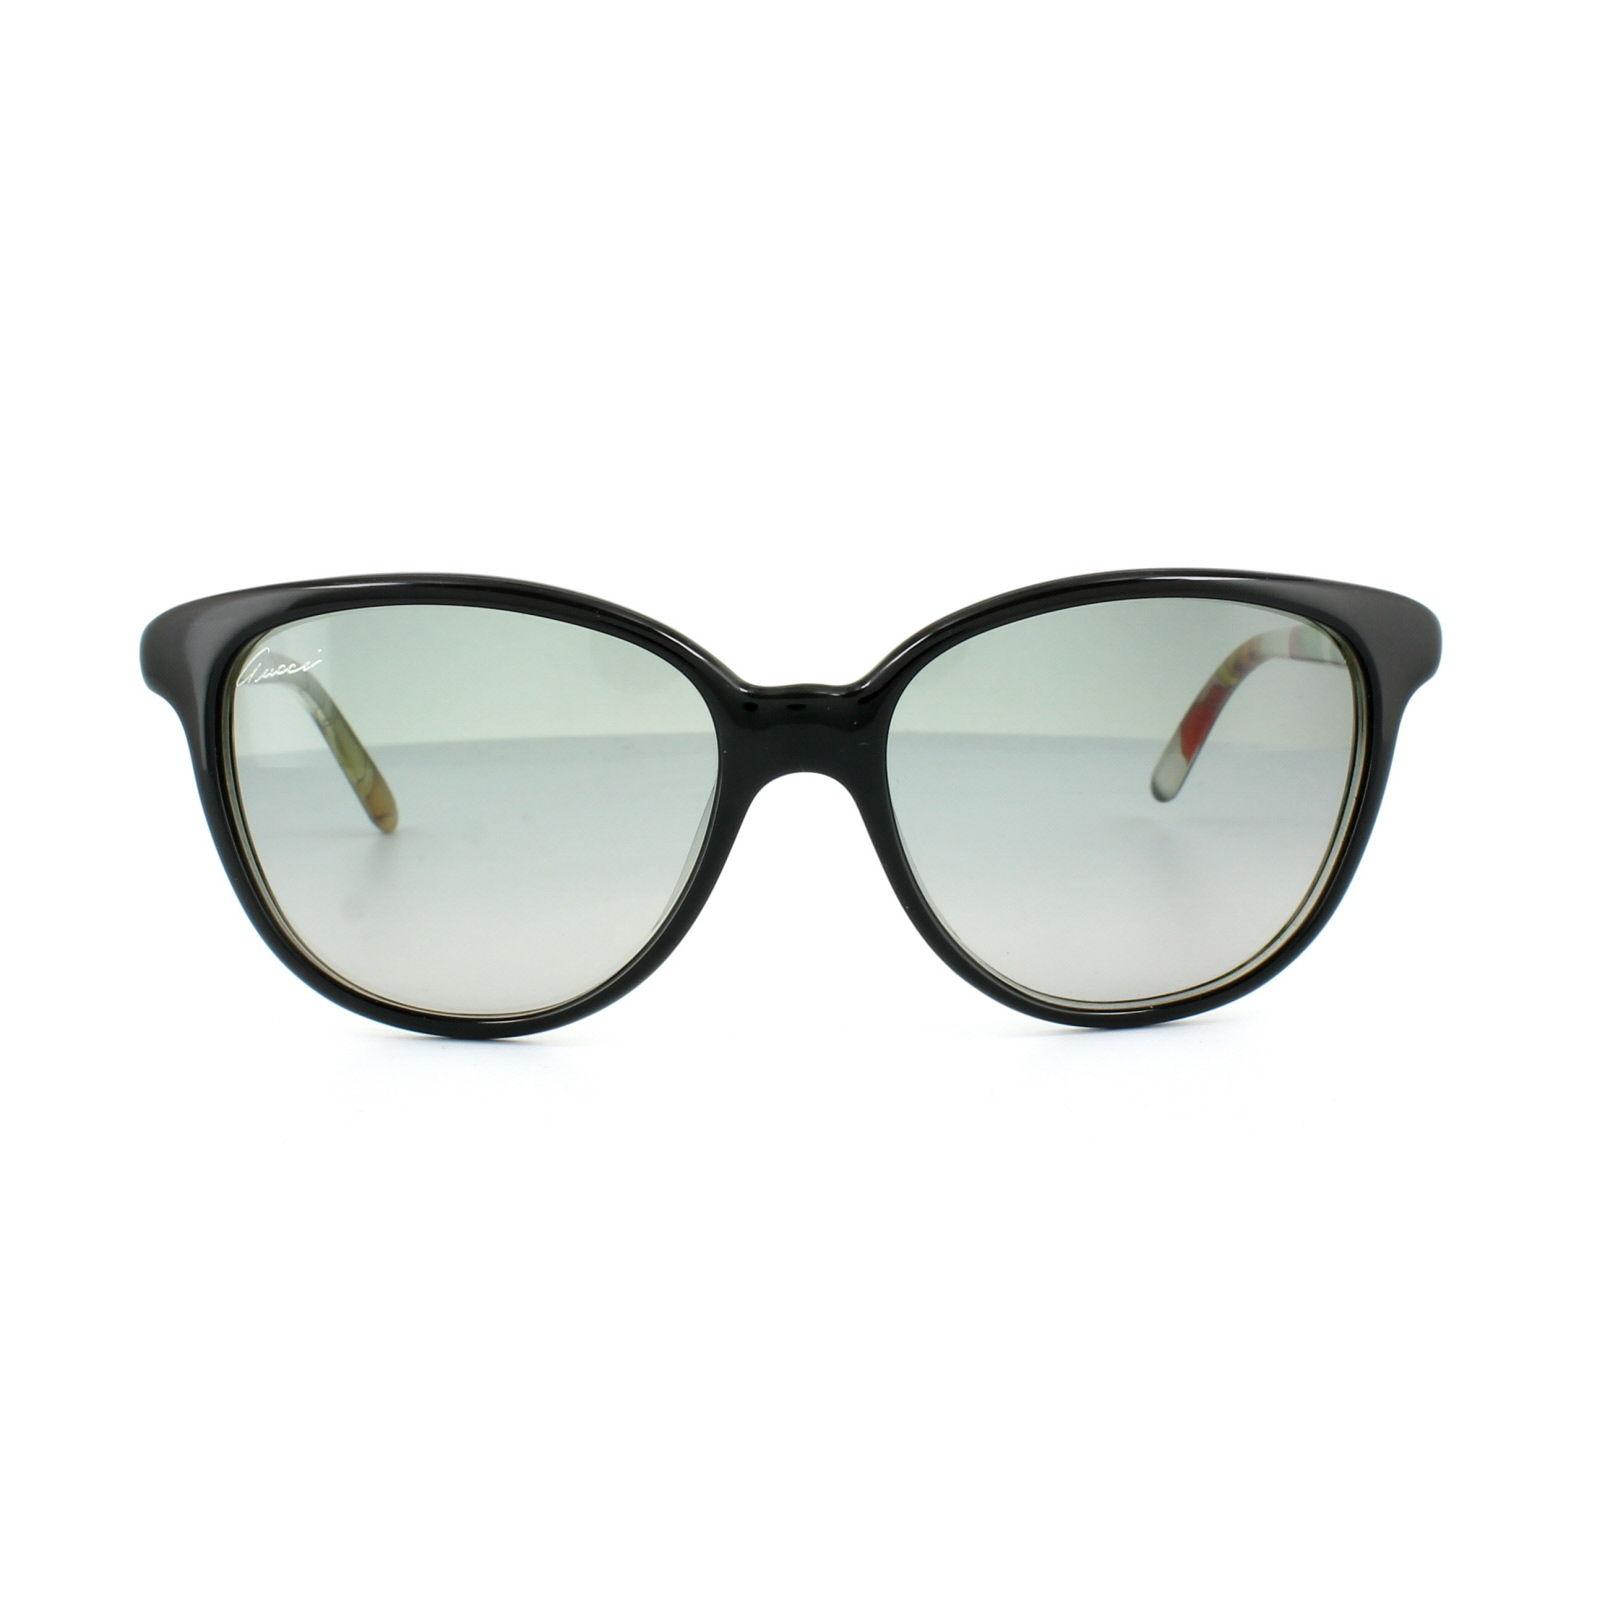 a42bdfbd69 GUCCI Sunglasses 3633   n   s z96 VK Black Flower Gray Gradient ...